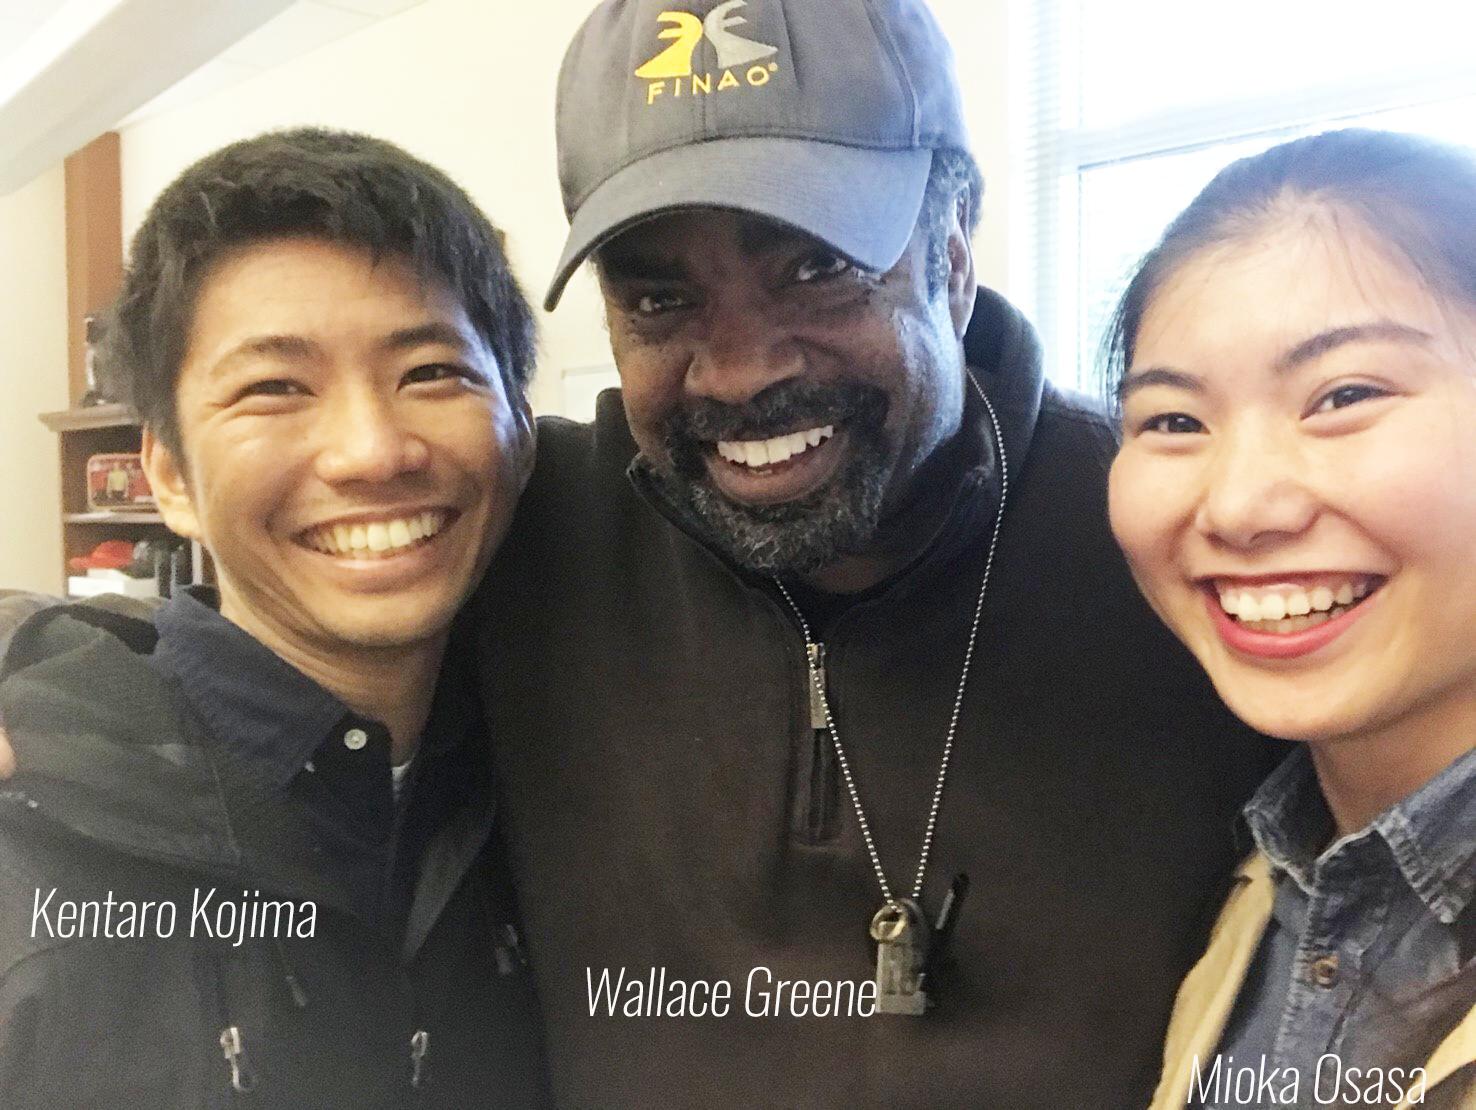 Kentaro Kojima and Mioka Osasa and Wallace Greene.png